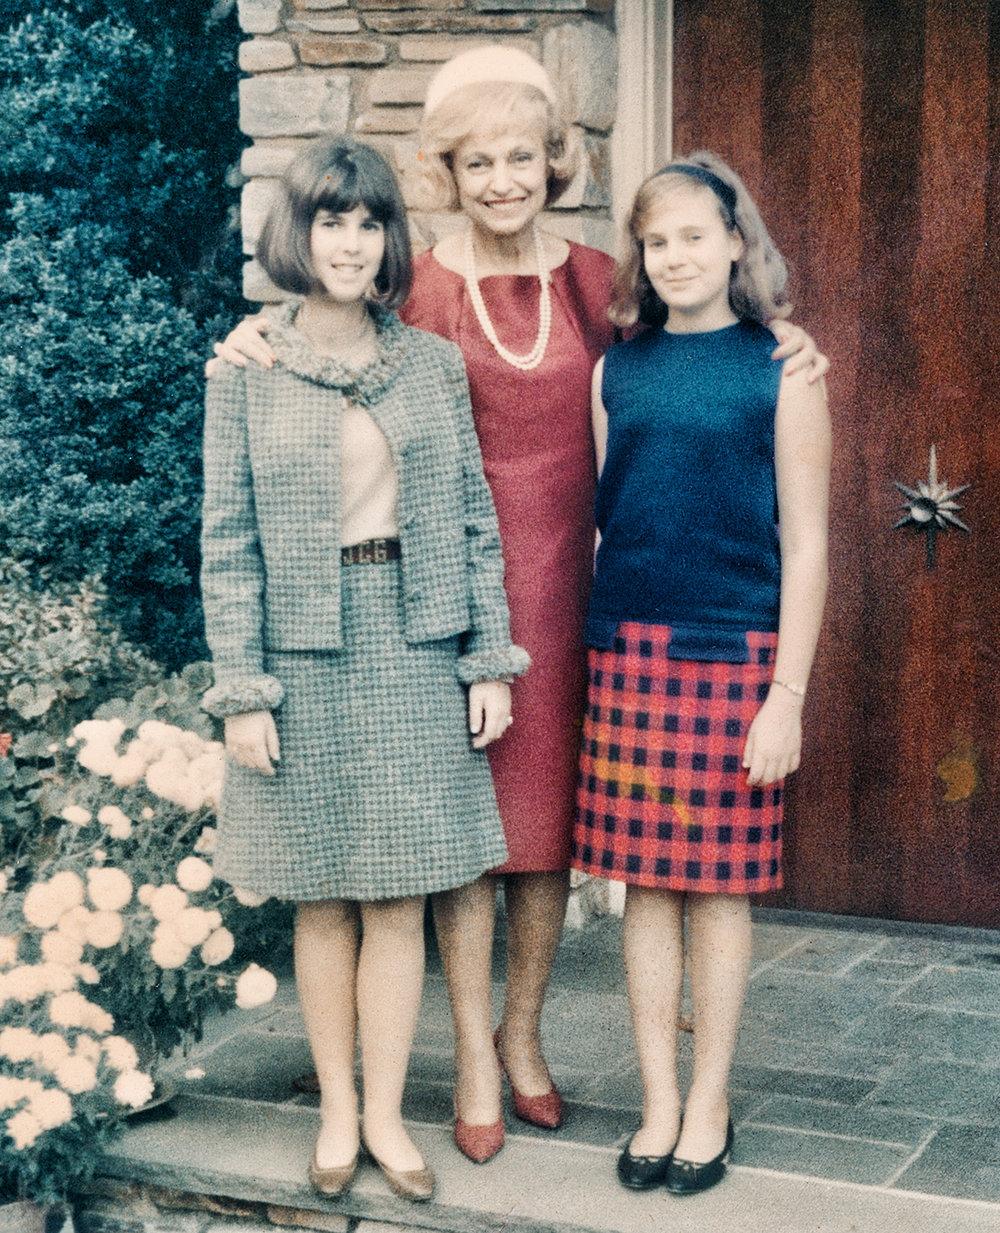 Joanna, Kathryn and Sally on Academy Lane